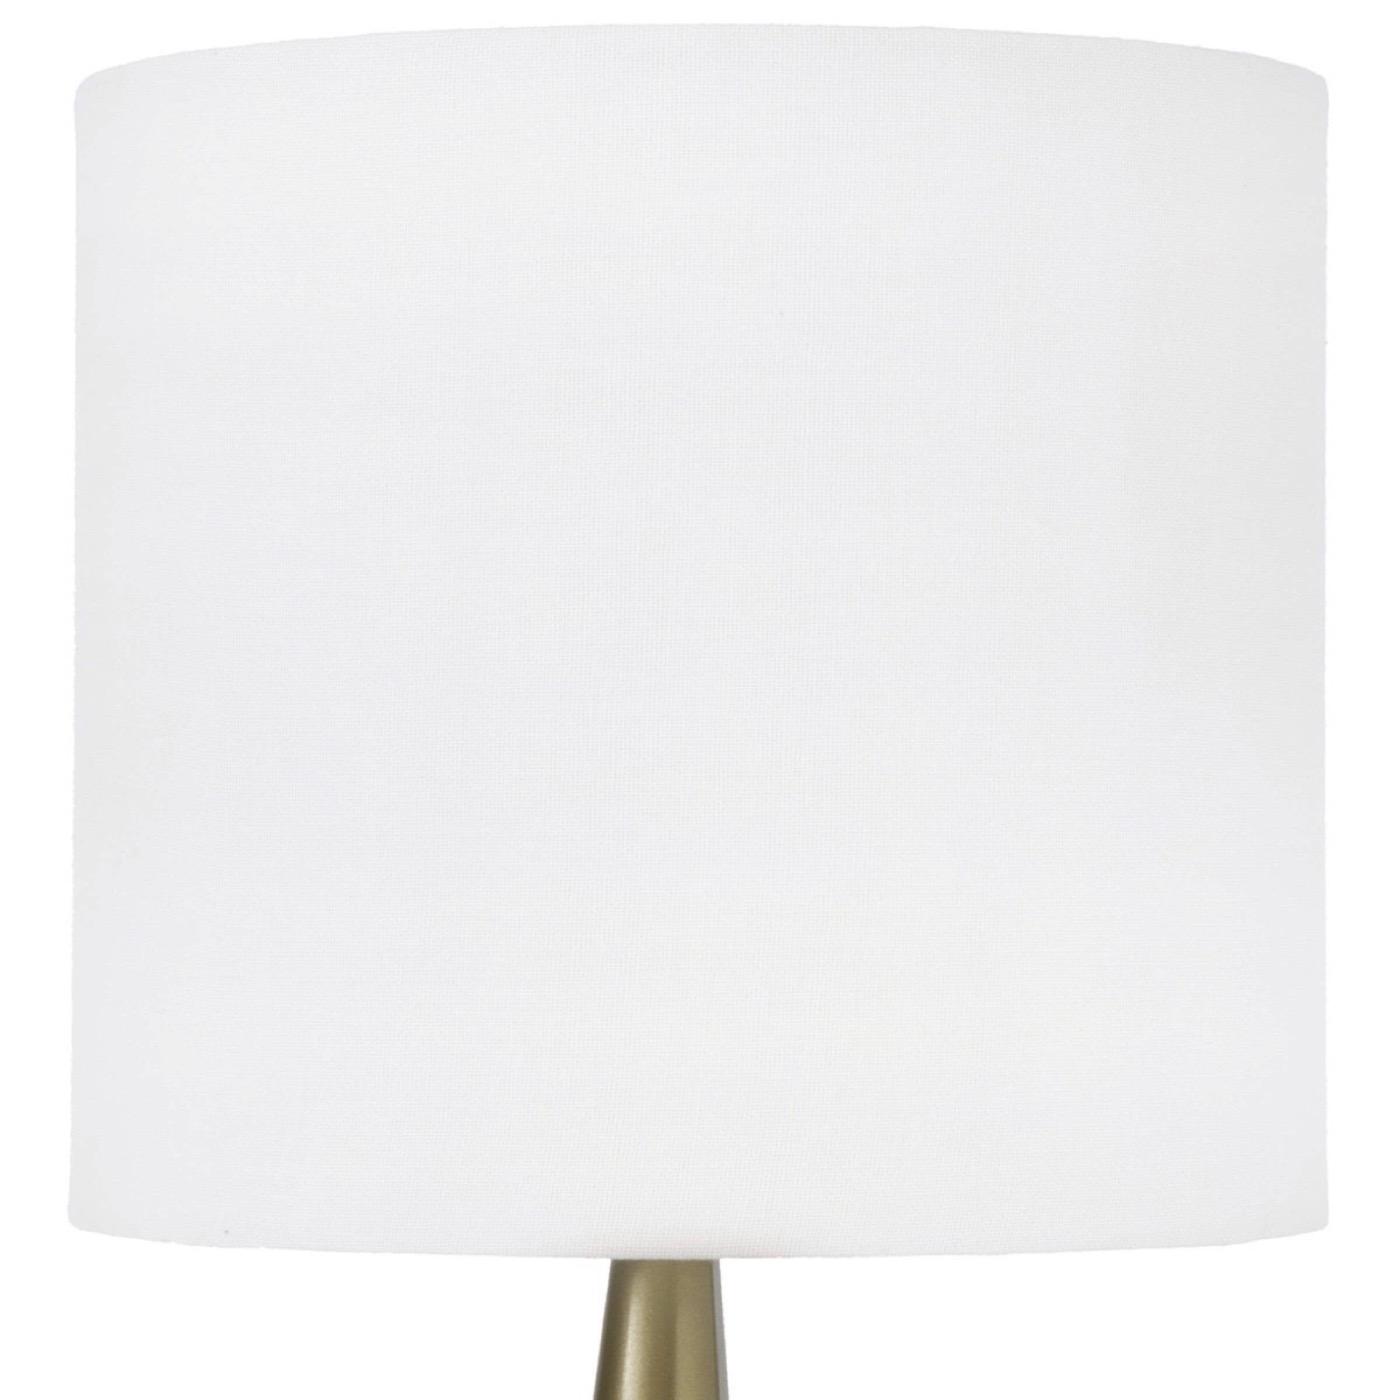 Janney Alabaster Table Lamp